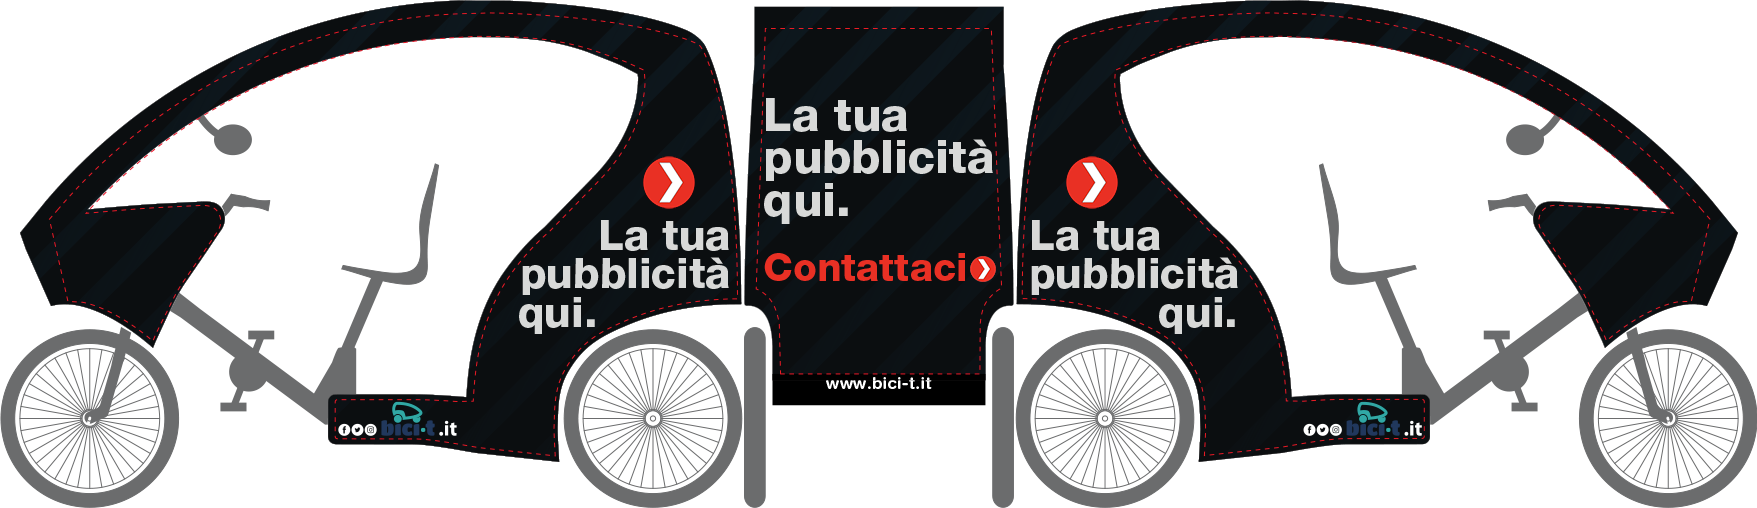 Bici-t. La tua pubblicità qui. Scrivi per info b2b@bici-t.it